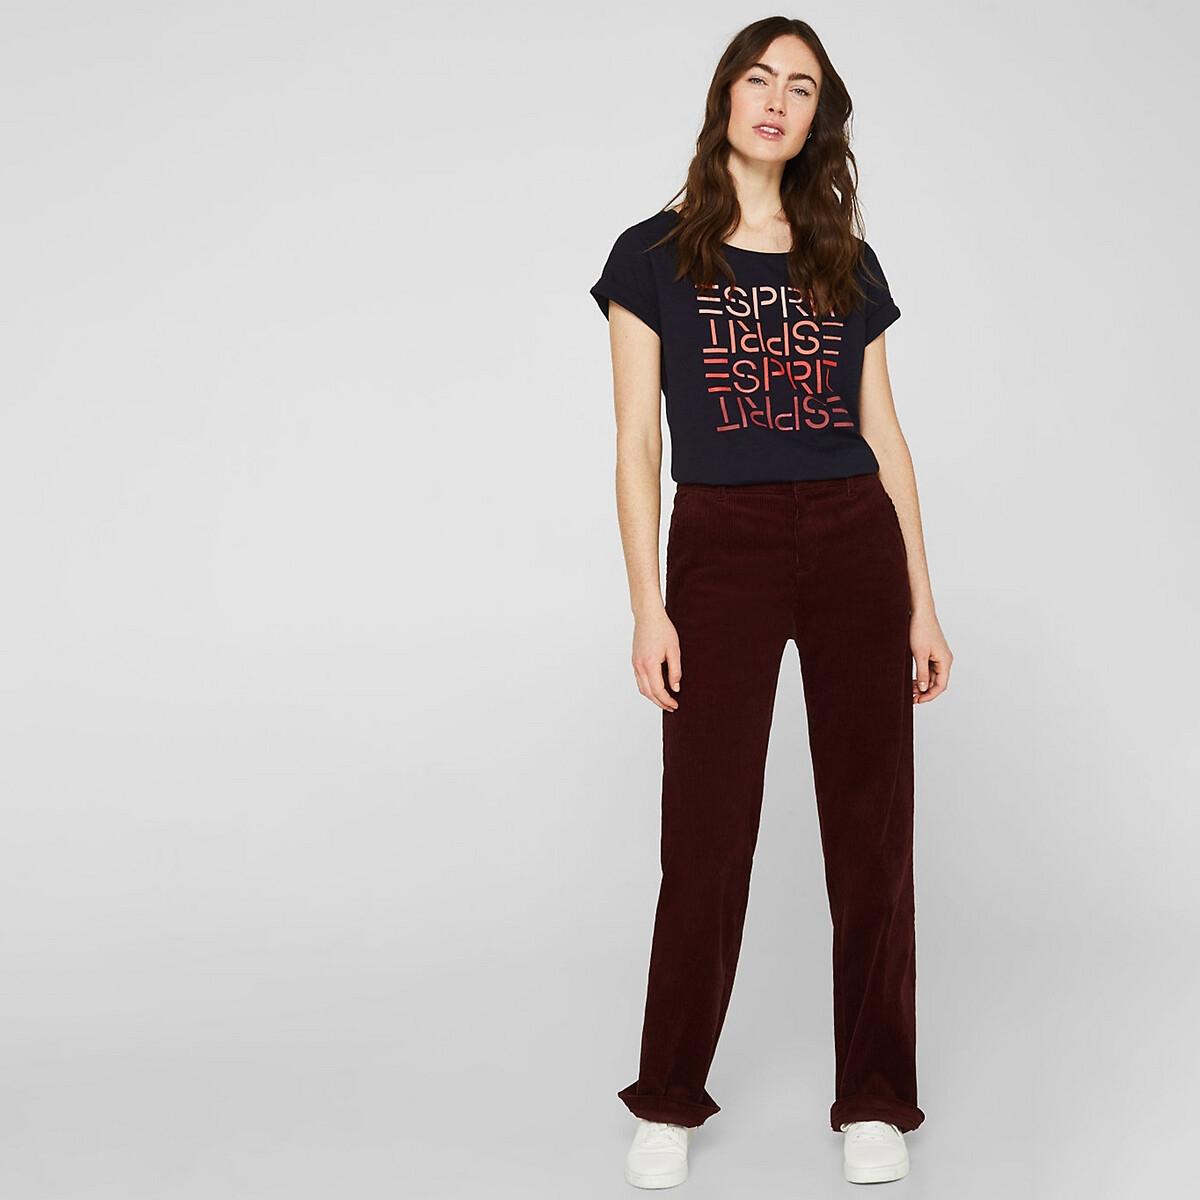 Camiseta de manga corta, algodón orgánico